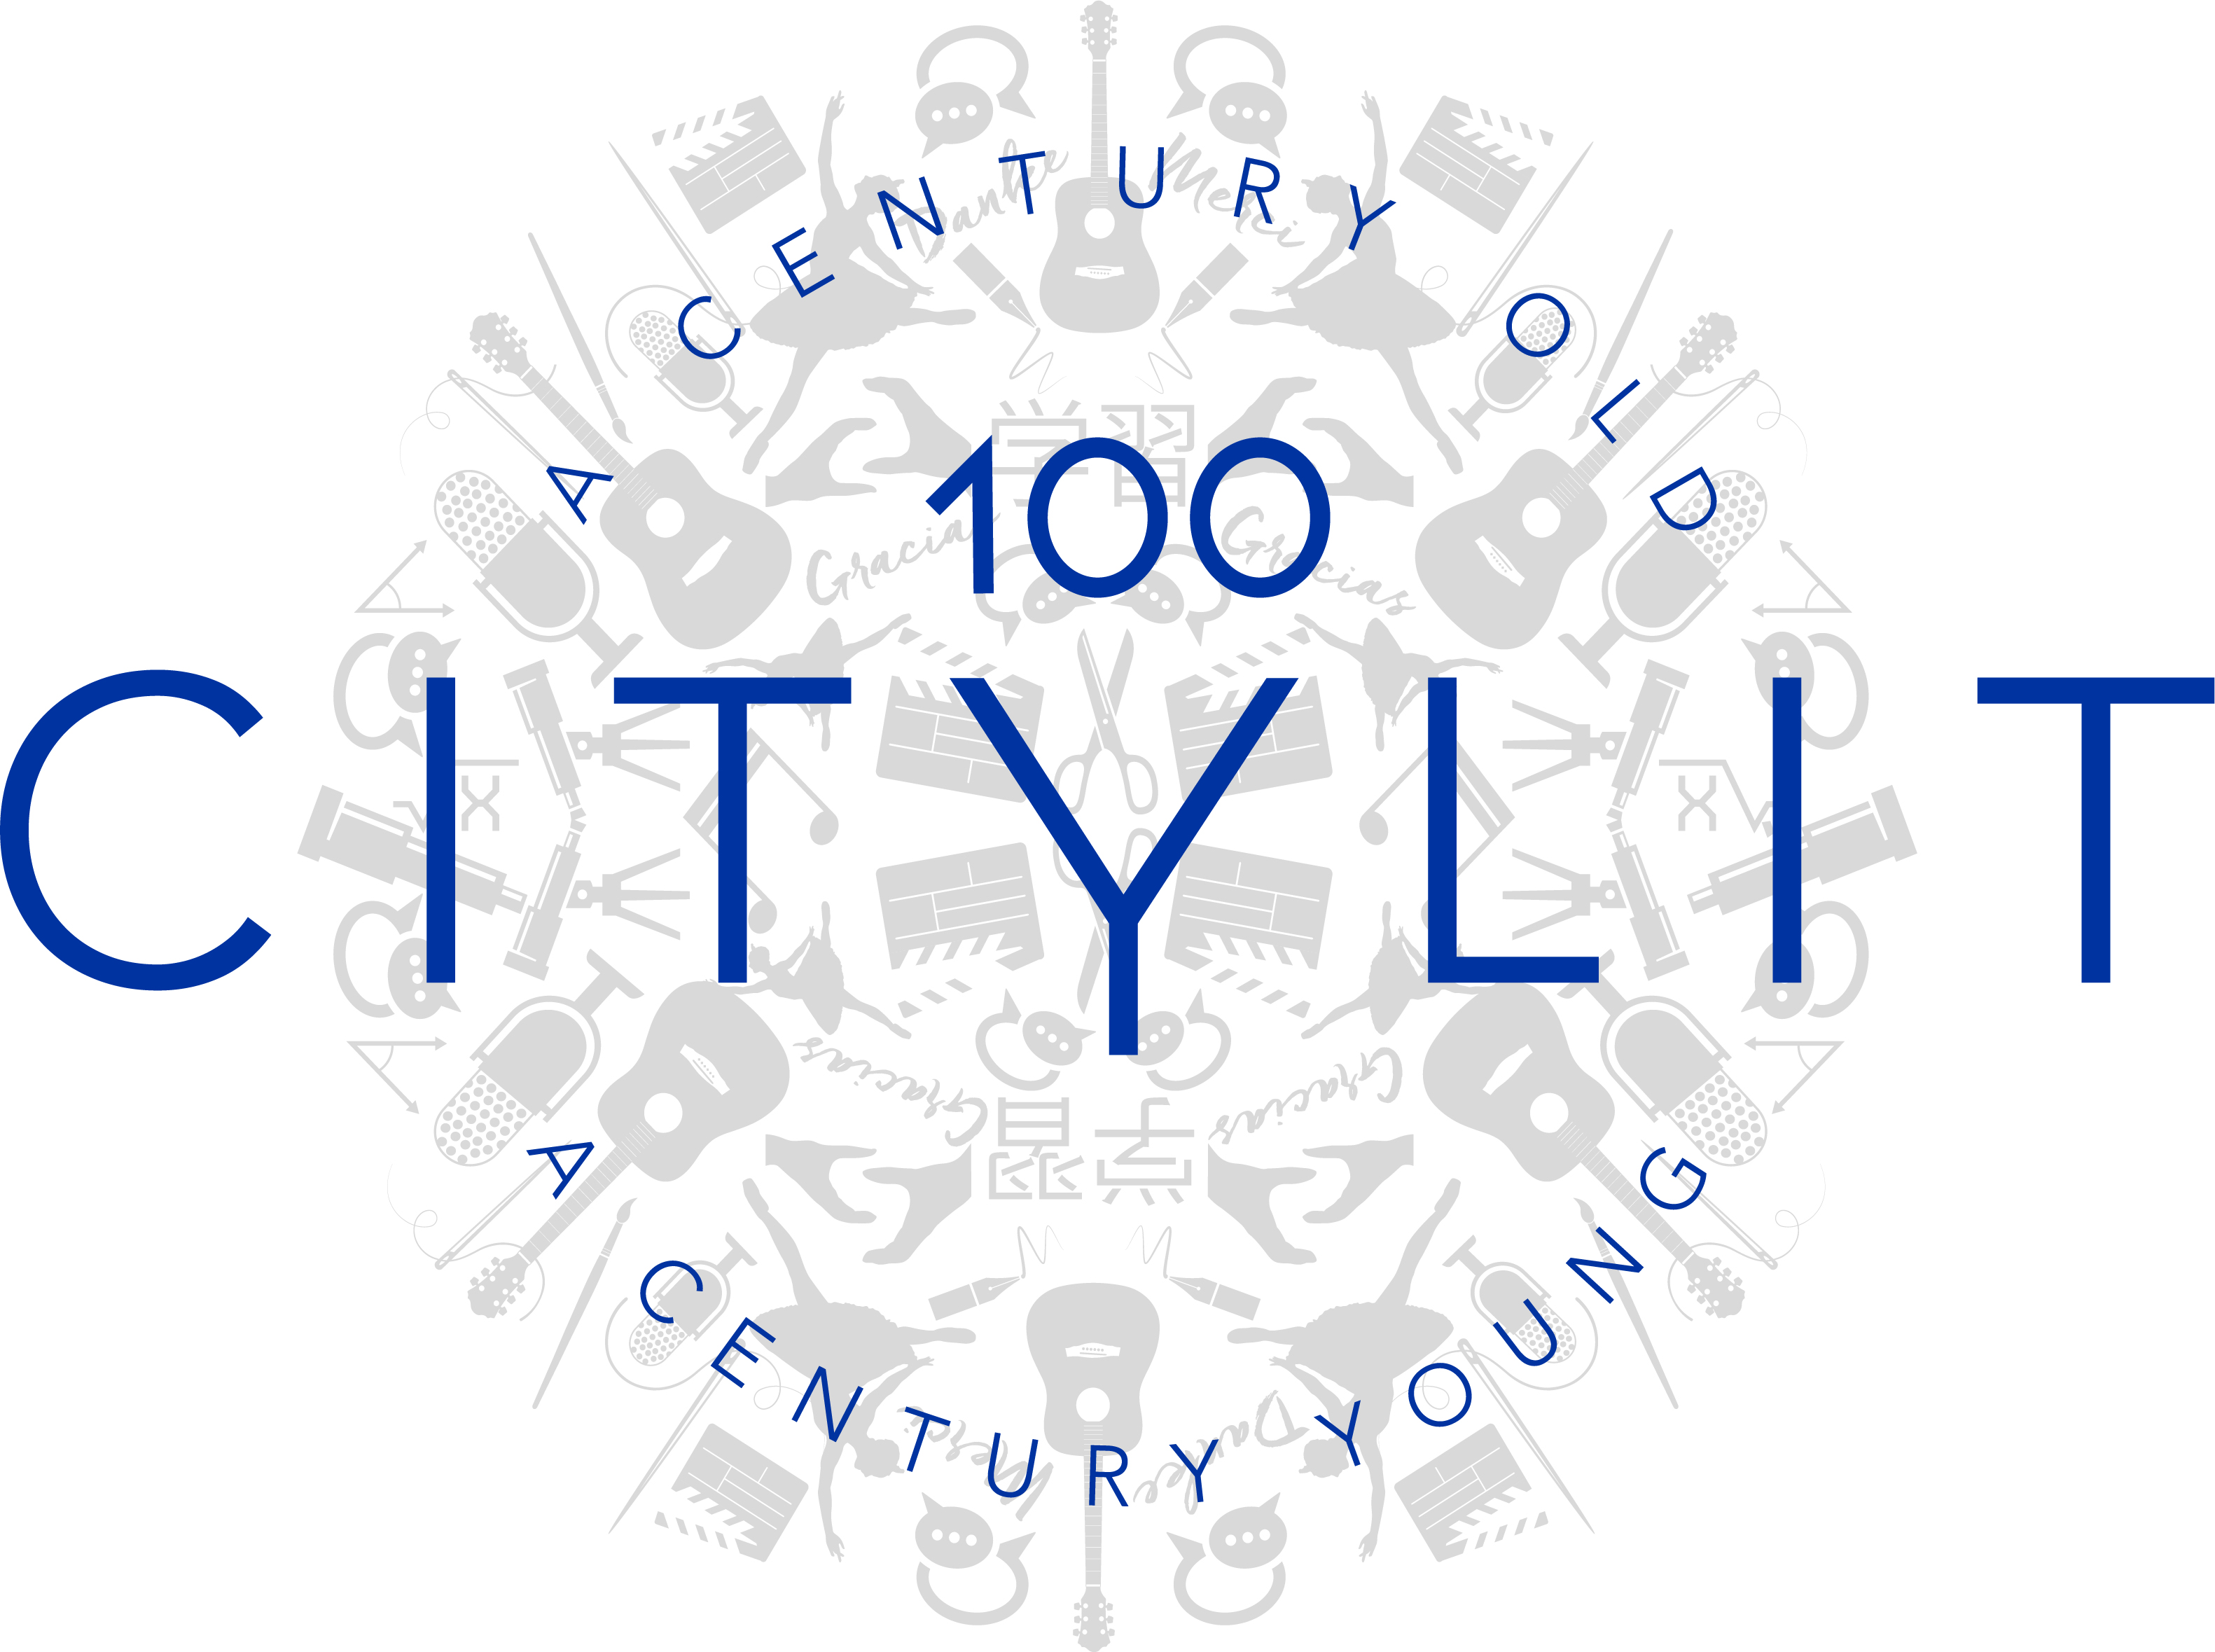 City Lit centenary logo